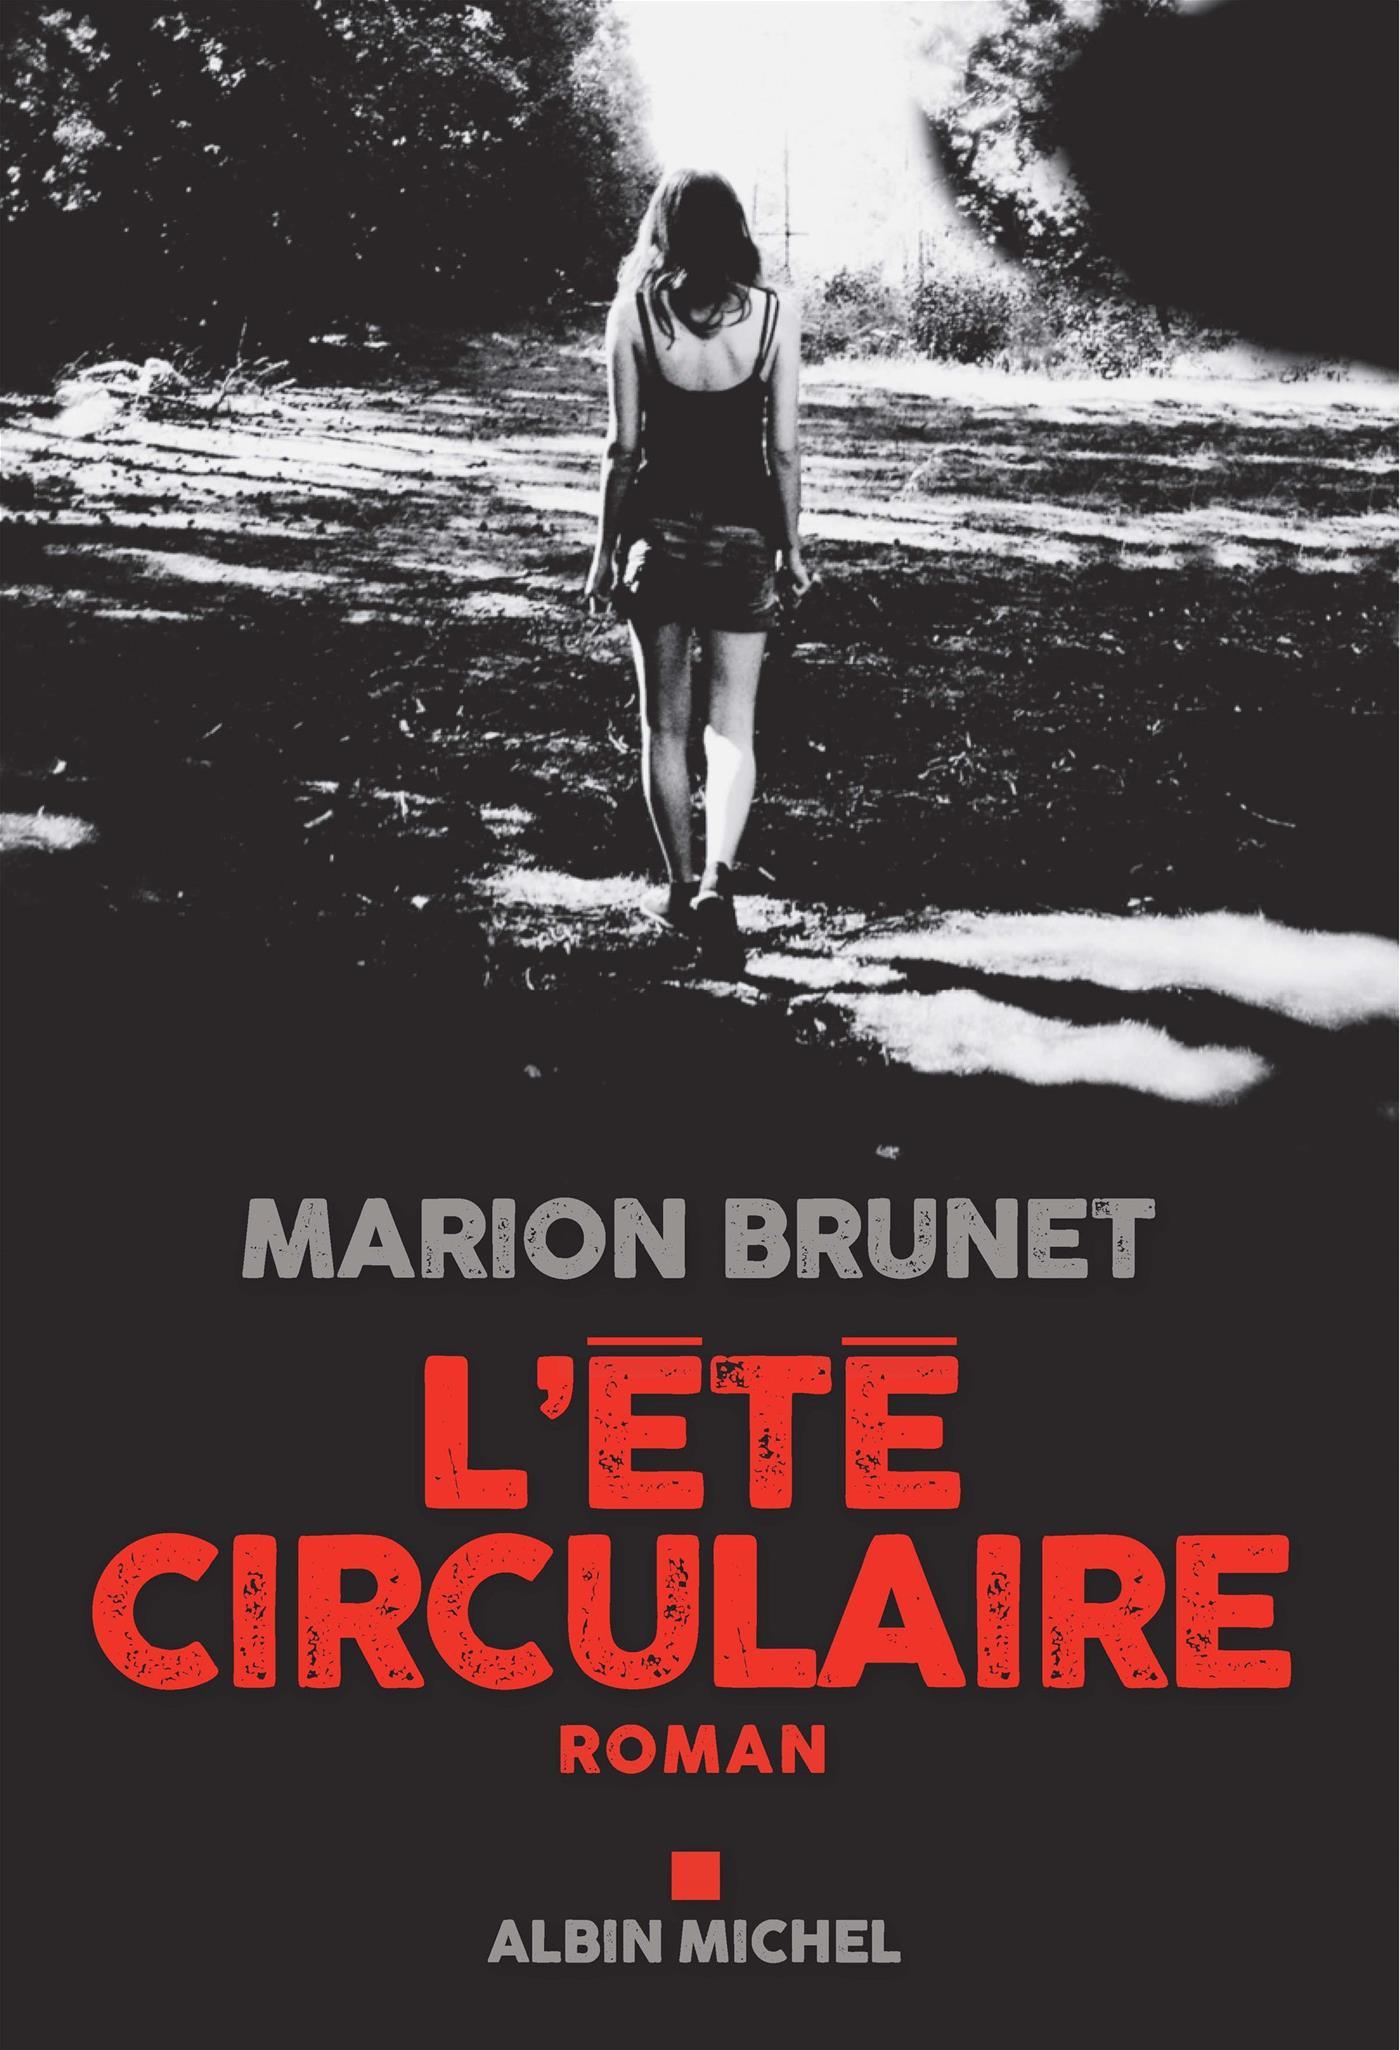 https://images.leslibraires.ca/books/9782226429148/front/9782226429148_large.jpg